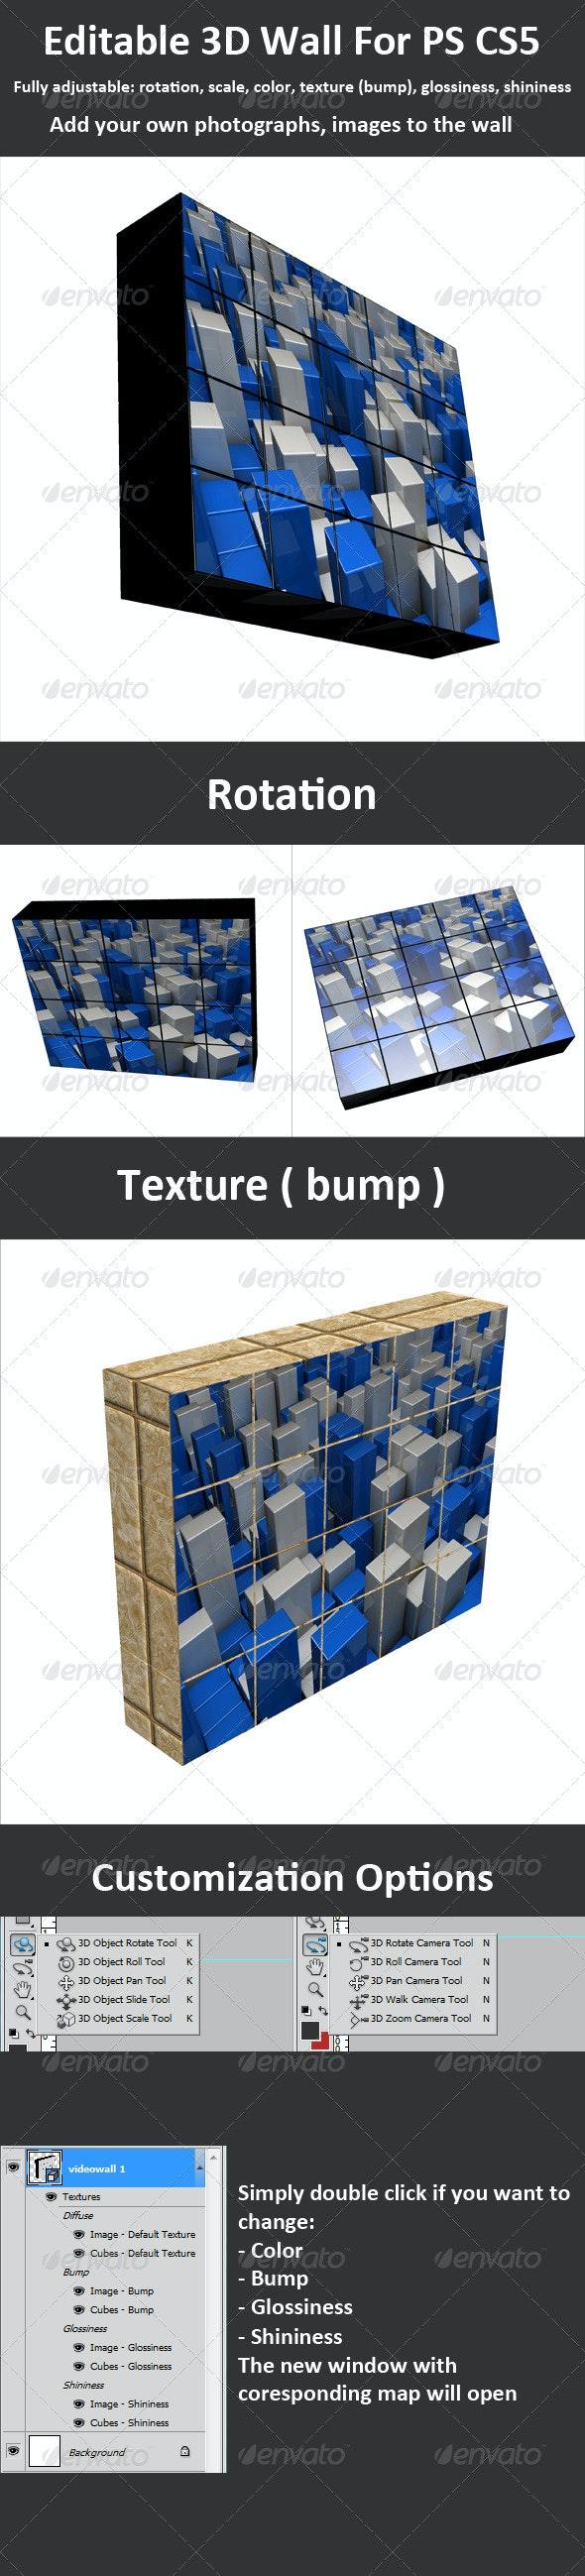 Editable 3D Wall for PS CS5, Full 3D Options - 3D Backgrounds